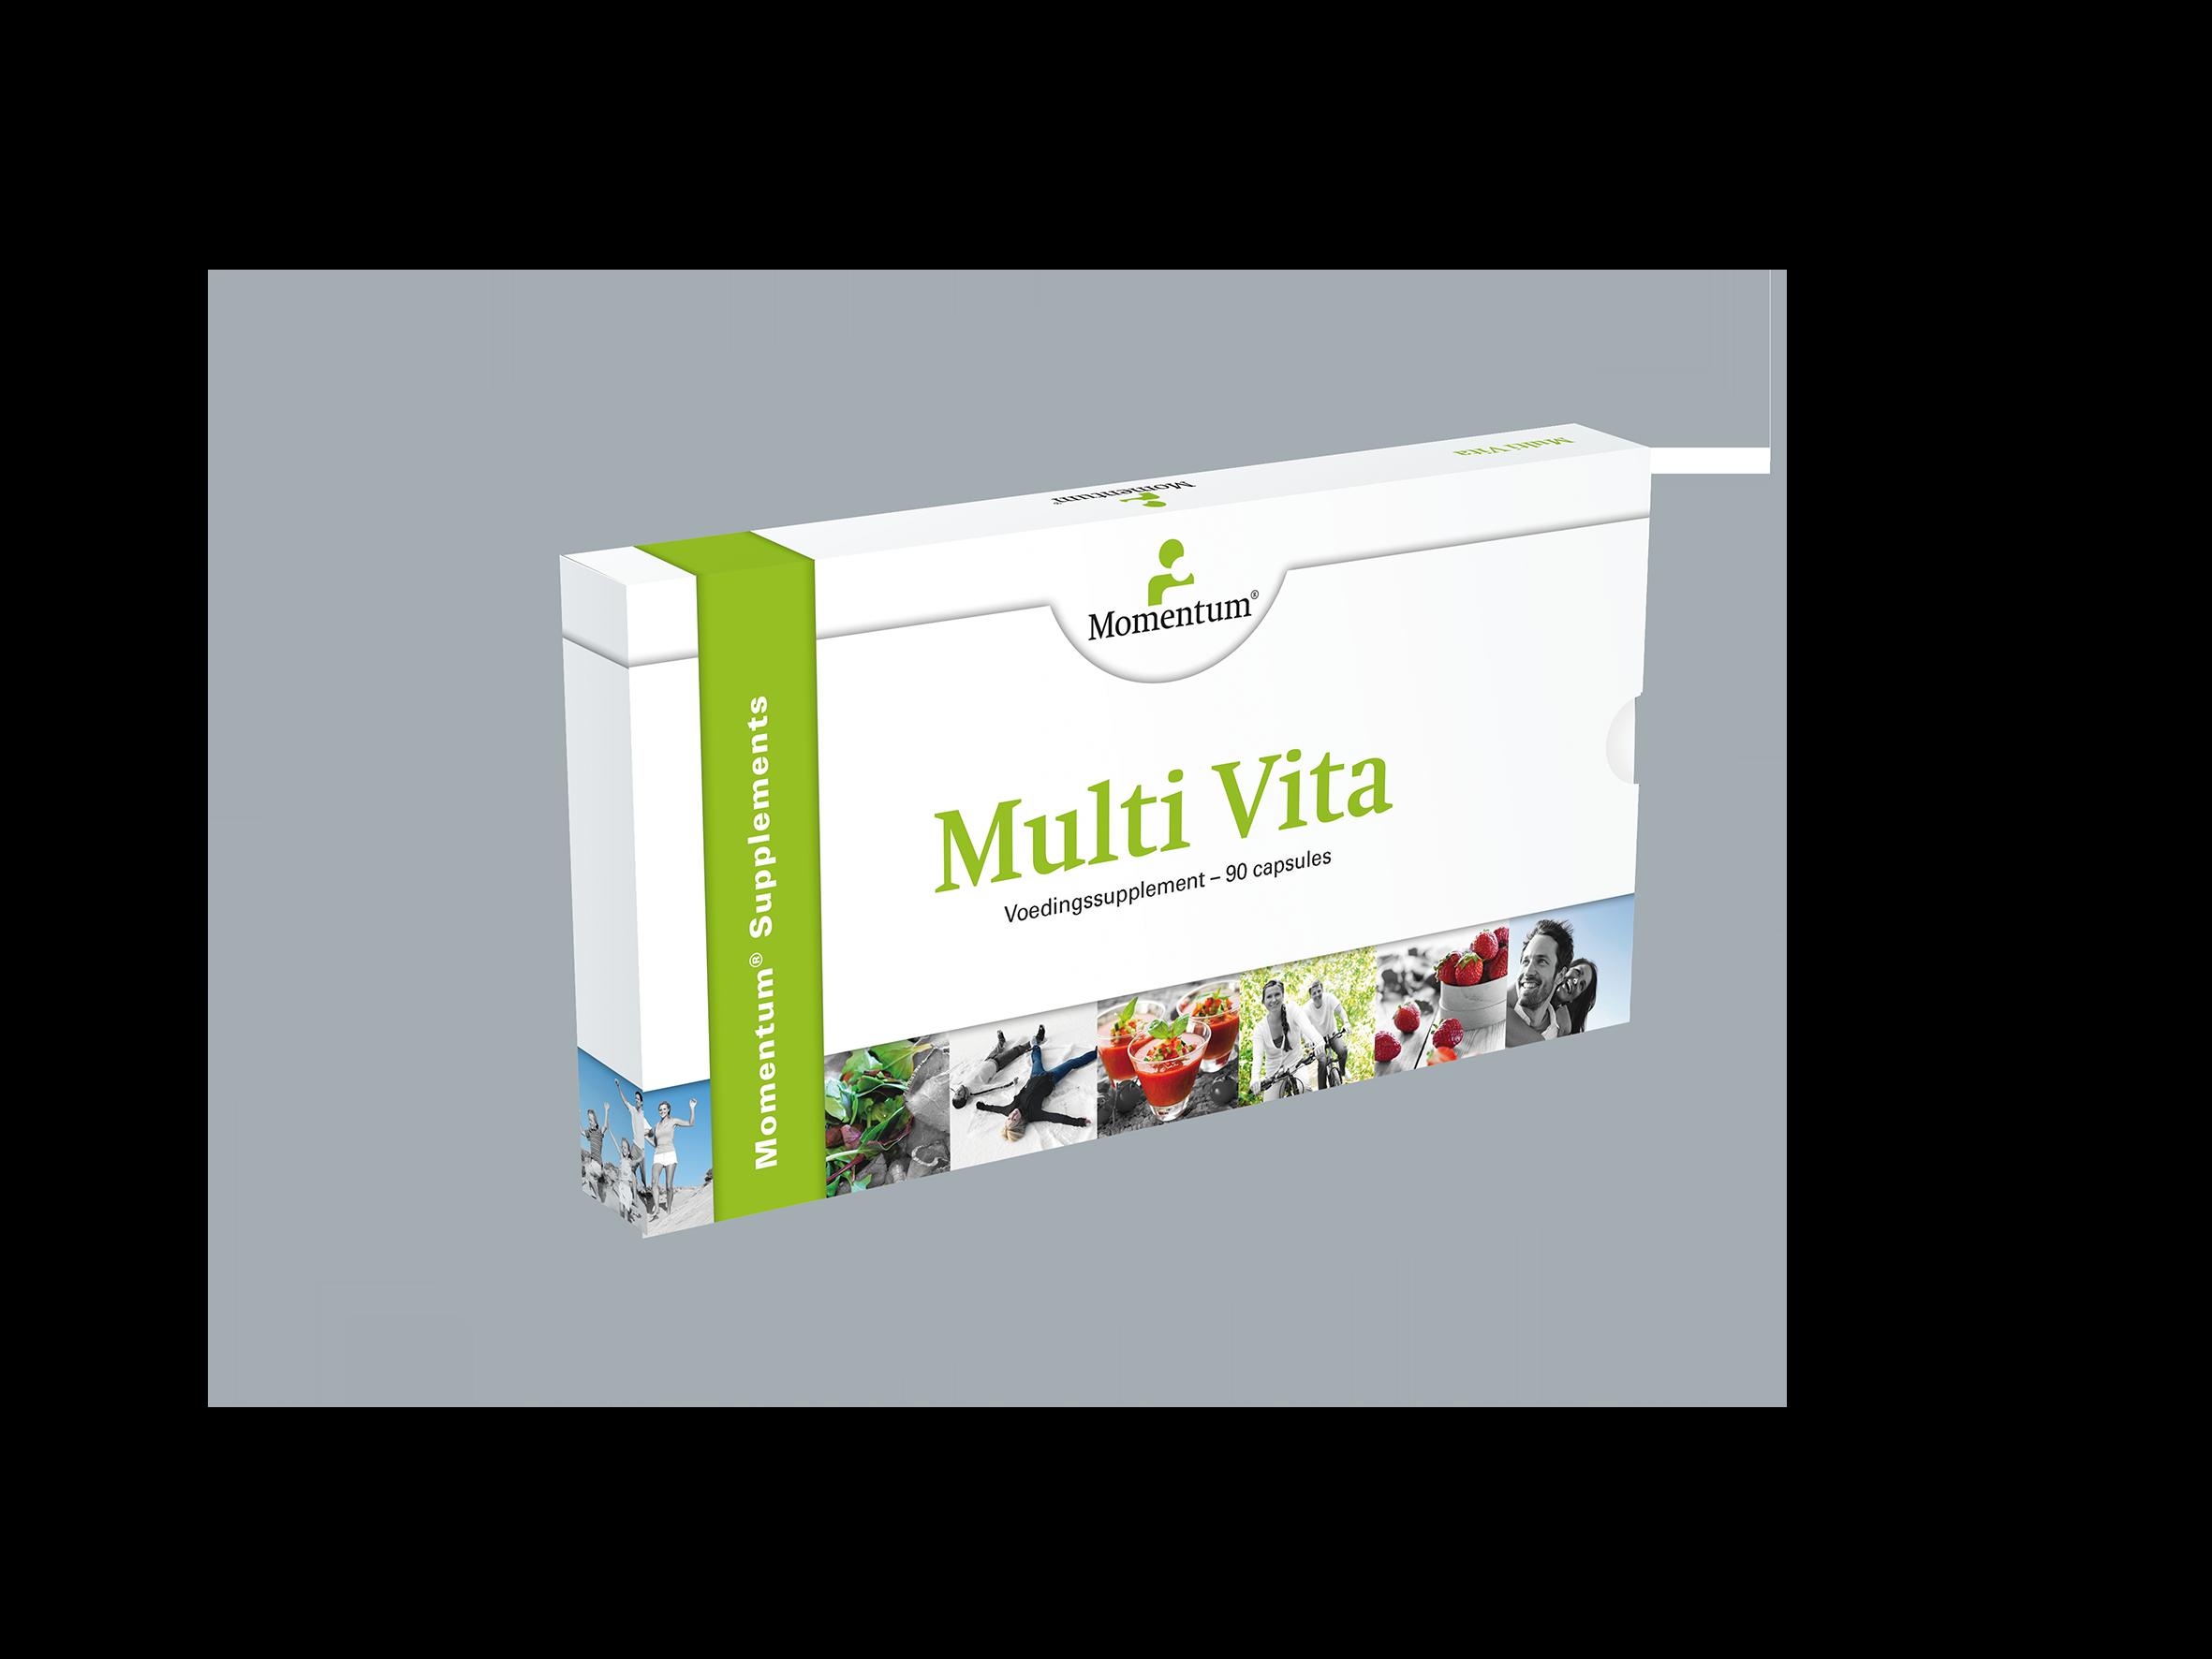 Multivita momentum sensas